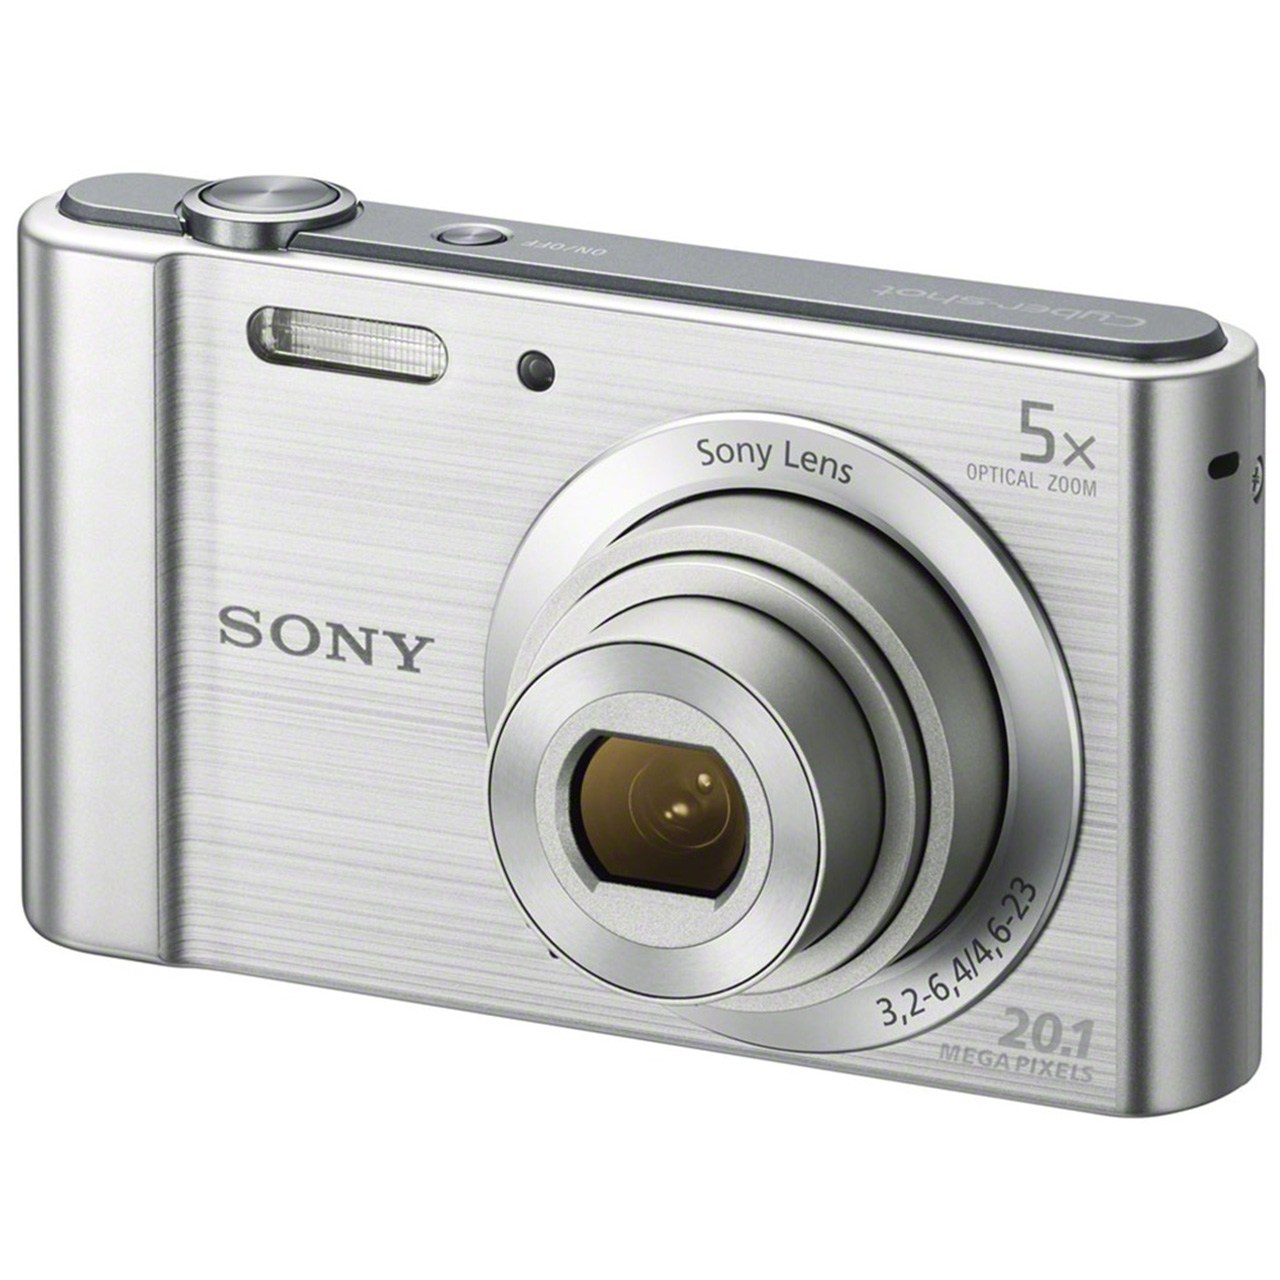 دوربين ديجيتال سوني مدل Sony Cyber-shot DSC-W800 Digital Camera